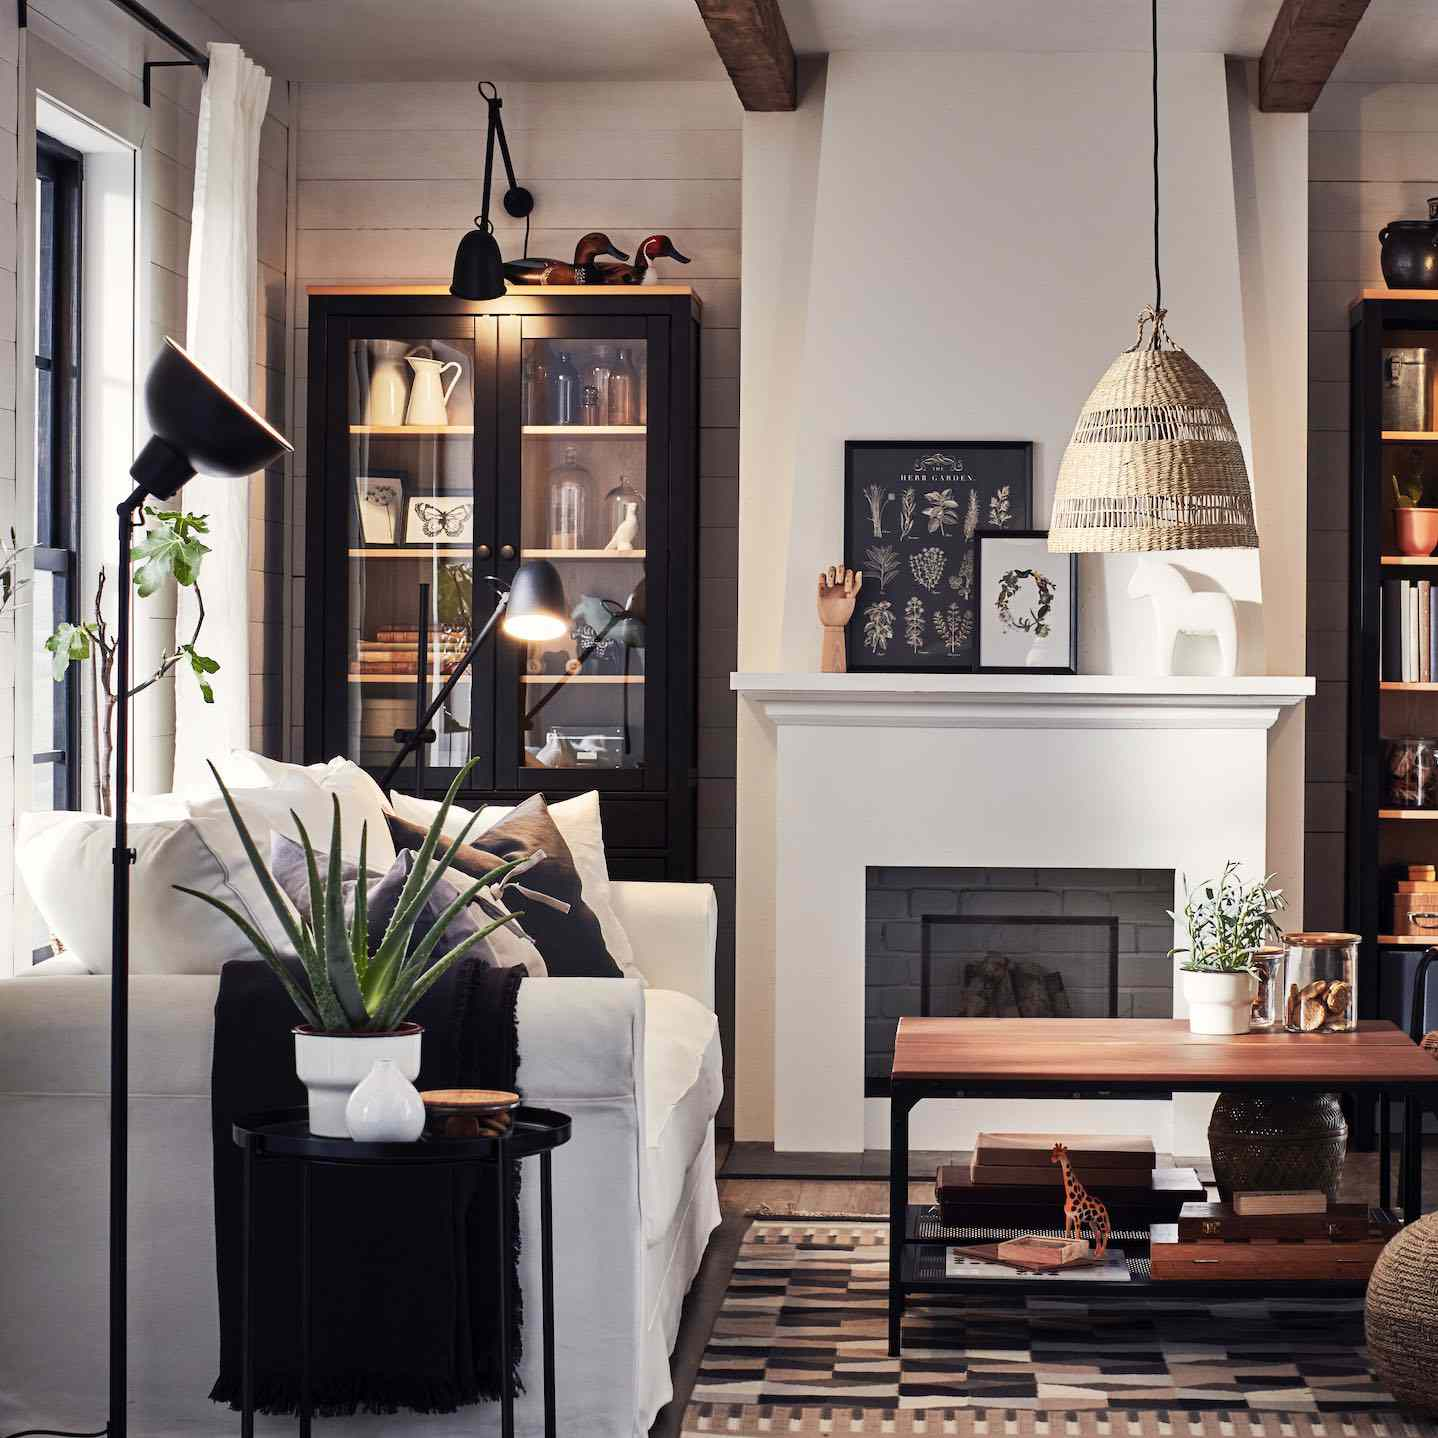 IKEA living room with plants.